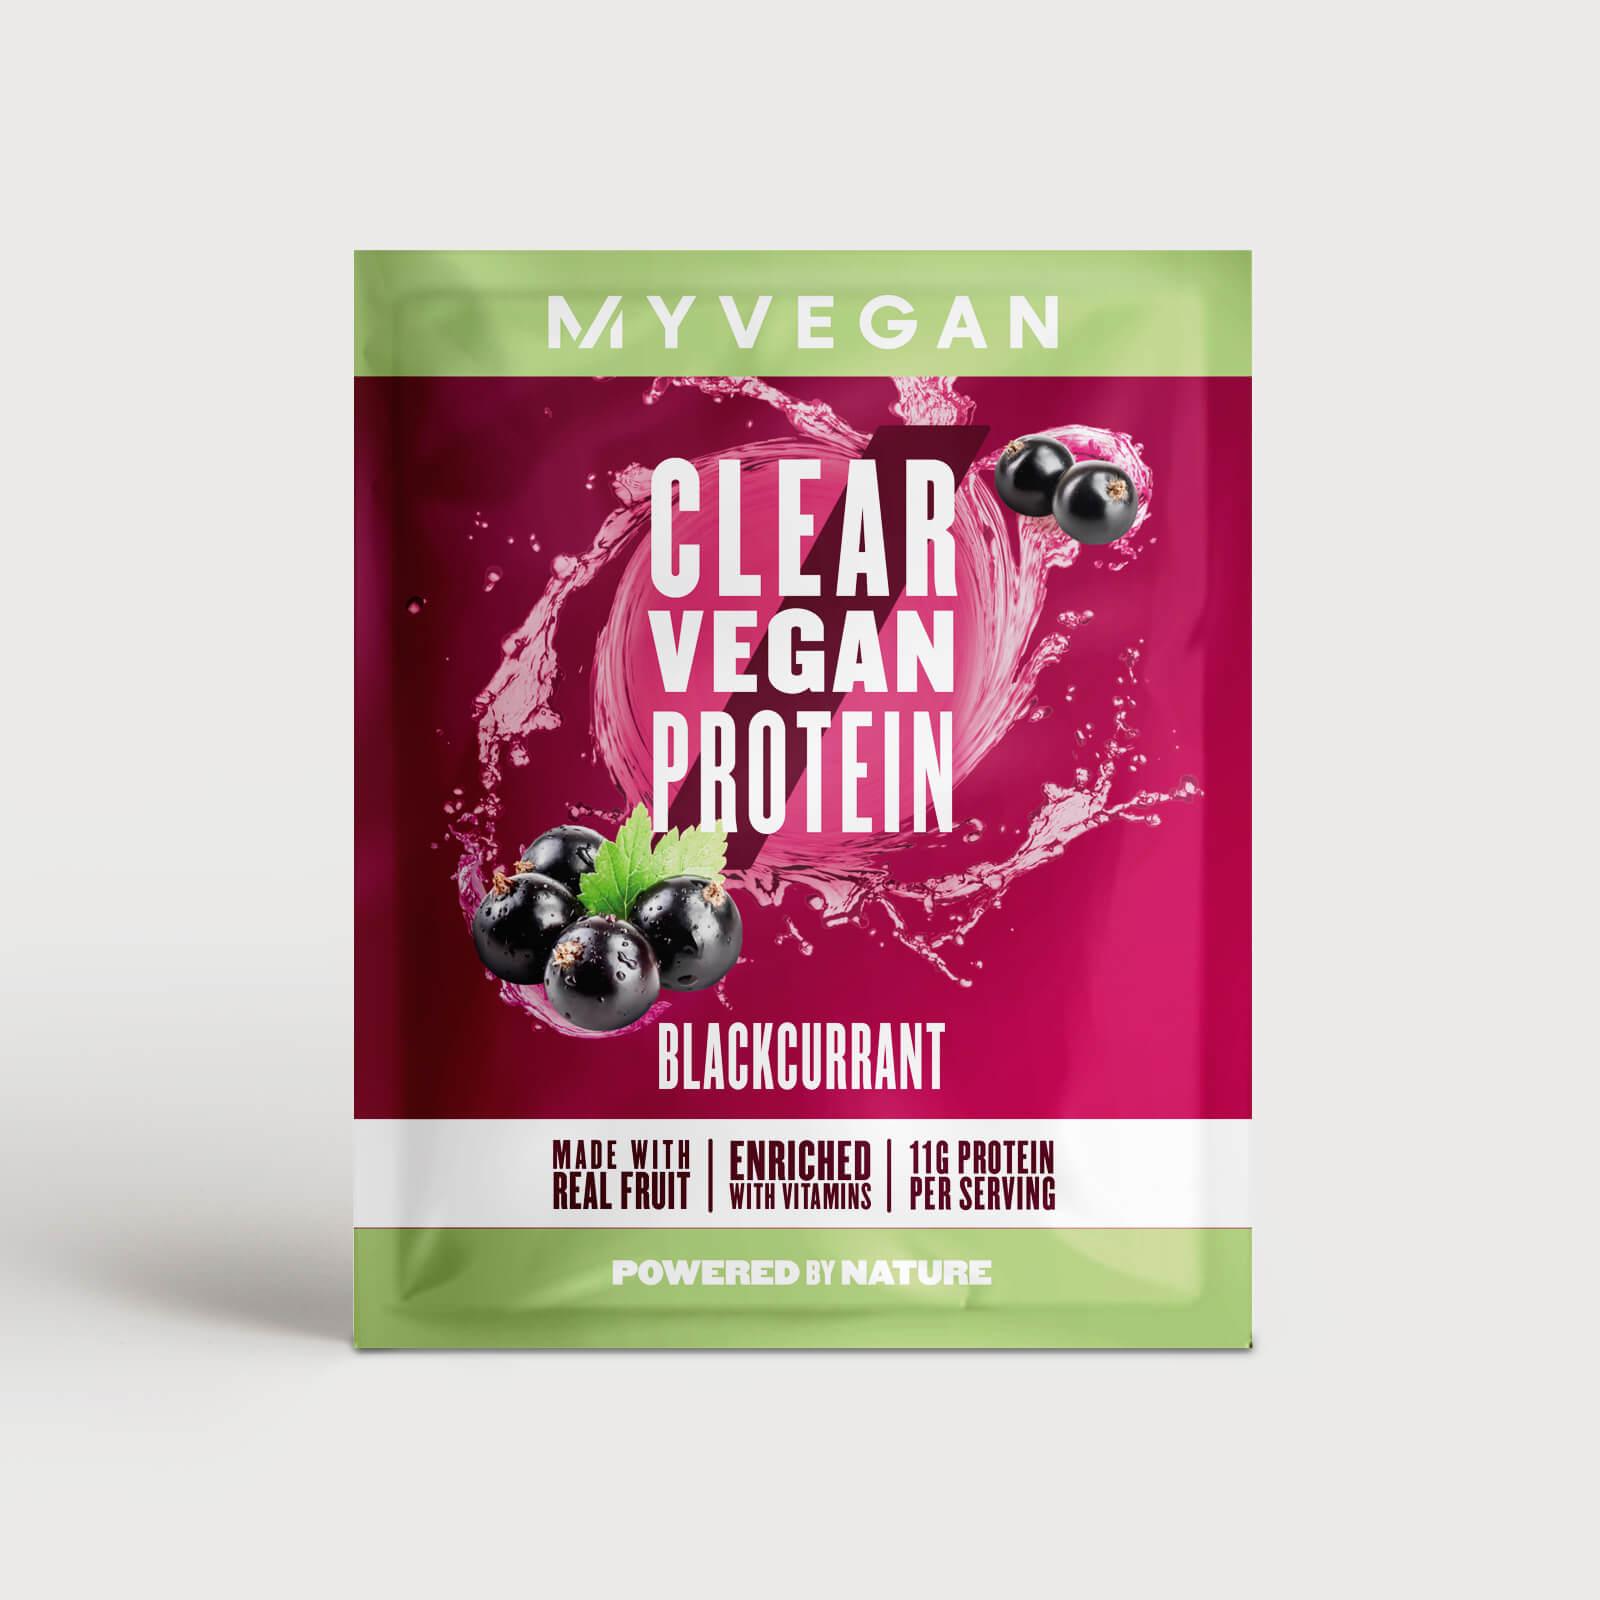 Myvegan Clear Vegan Protein, 16g (Sample) - Cassis